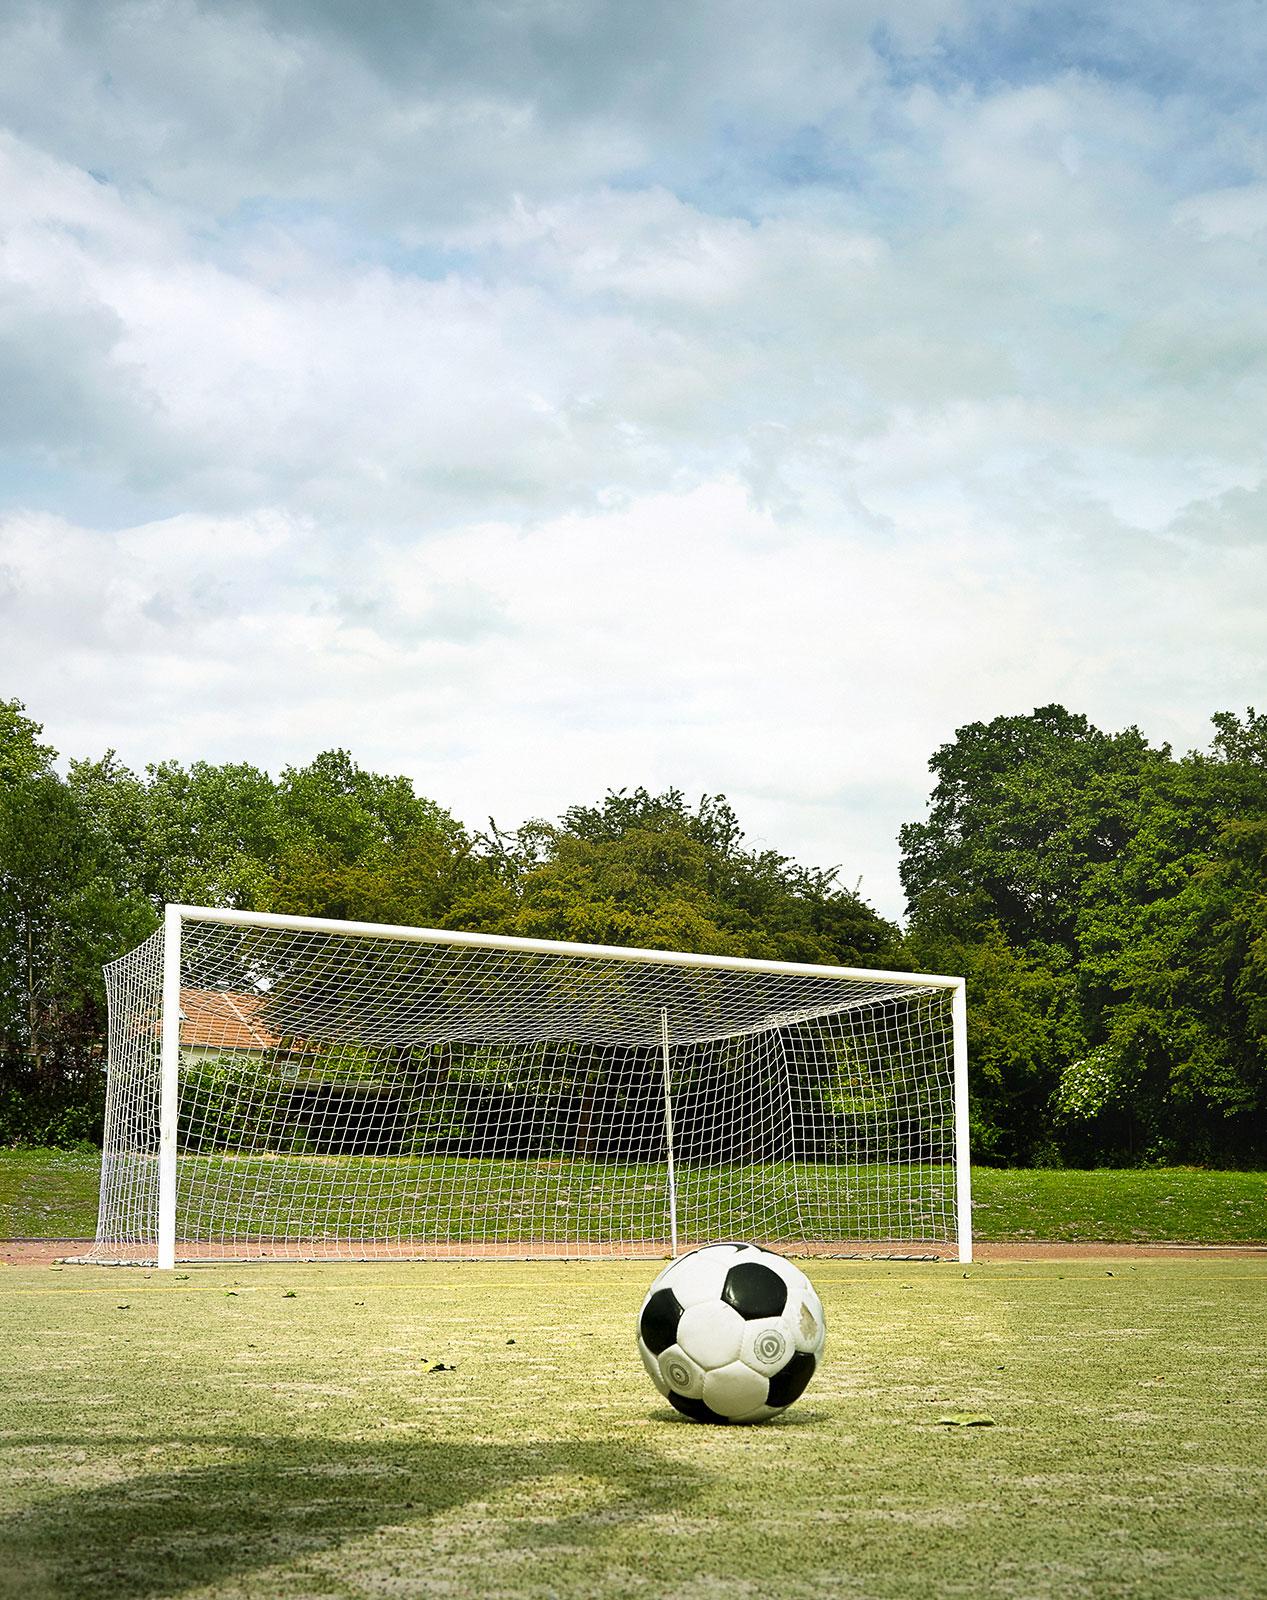 VL_Soccer_01